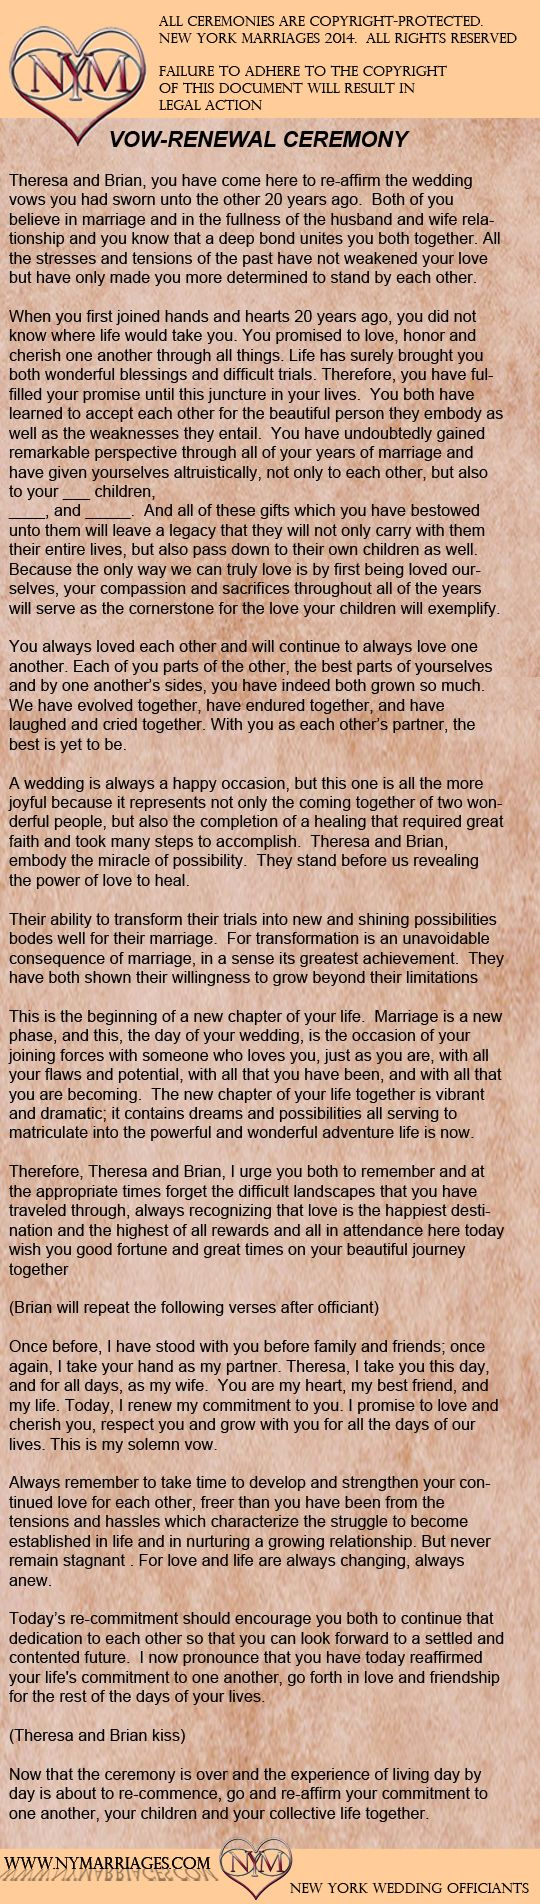 Wine Box Love Letter Ceremony Sample Wedding Ceremonies New York Officiant Long